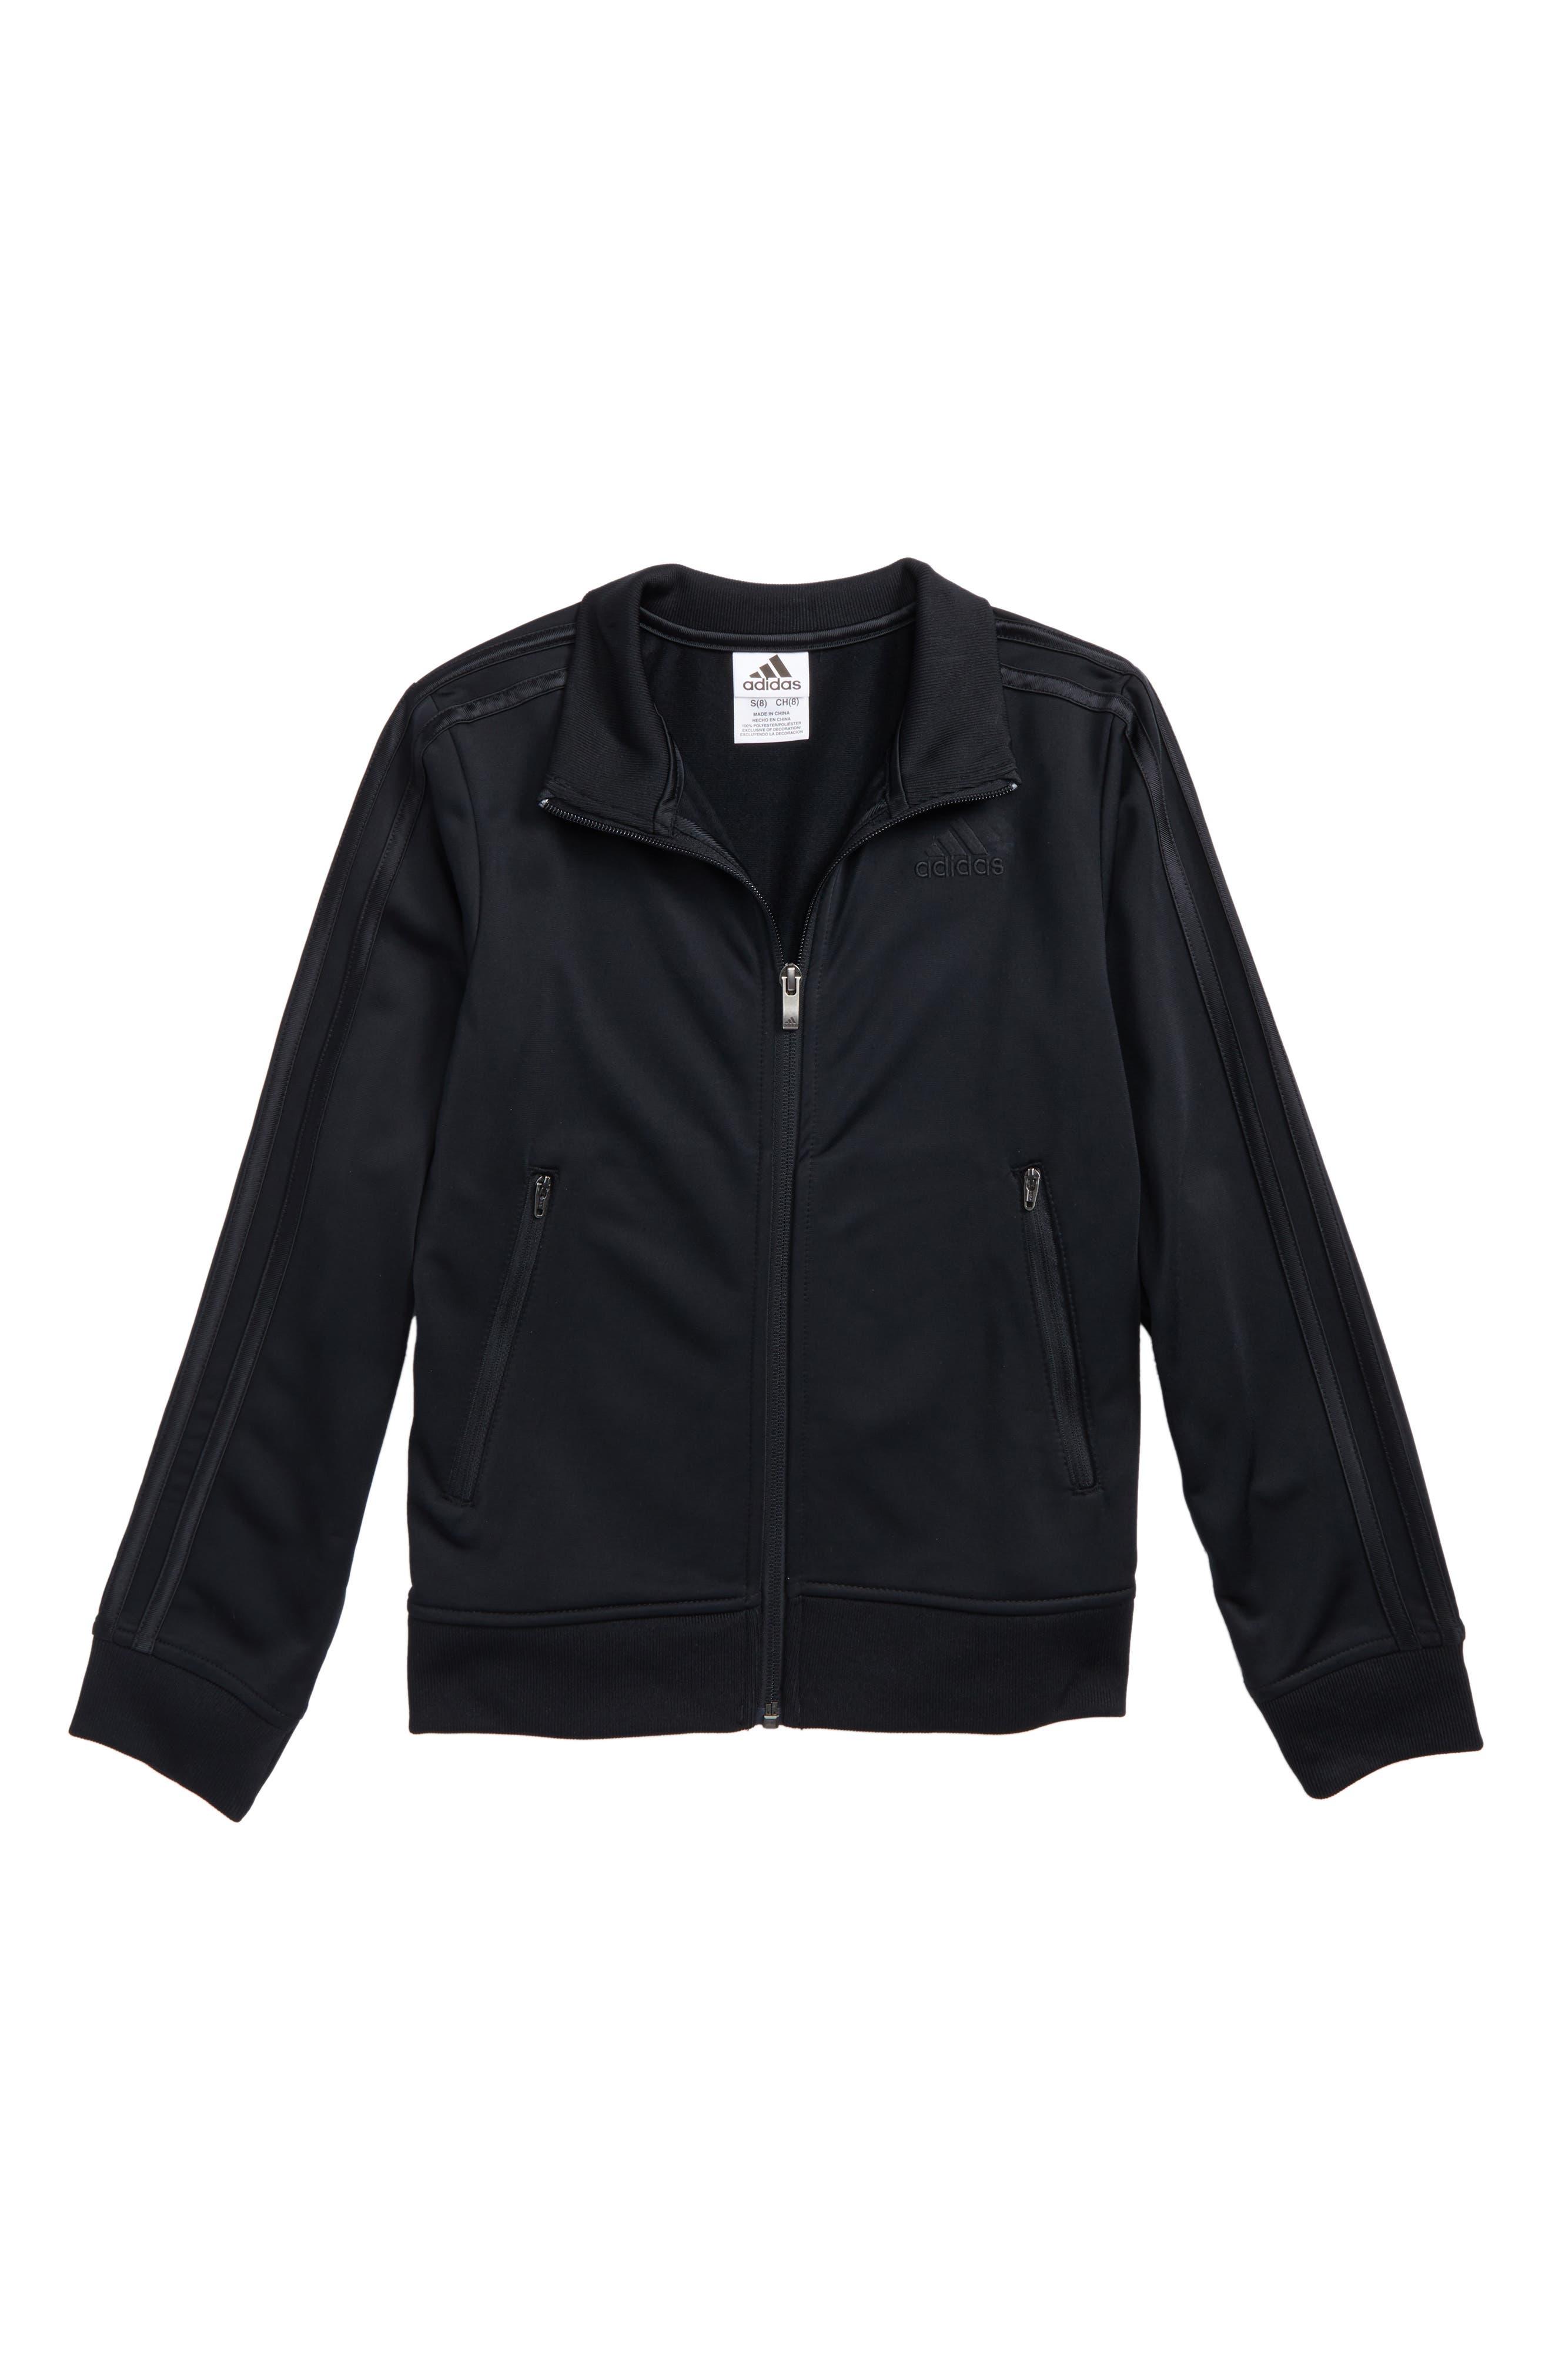 Co-Ed Designator Jacket,                         Main,                         color, 004